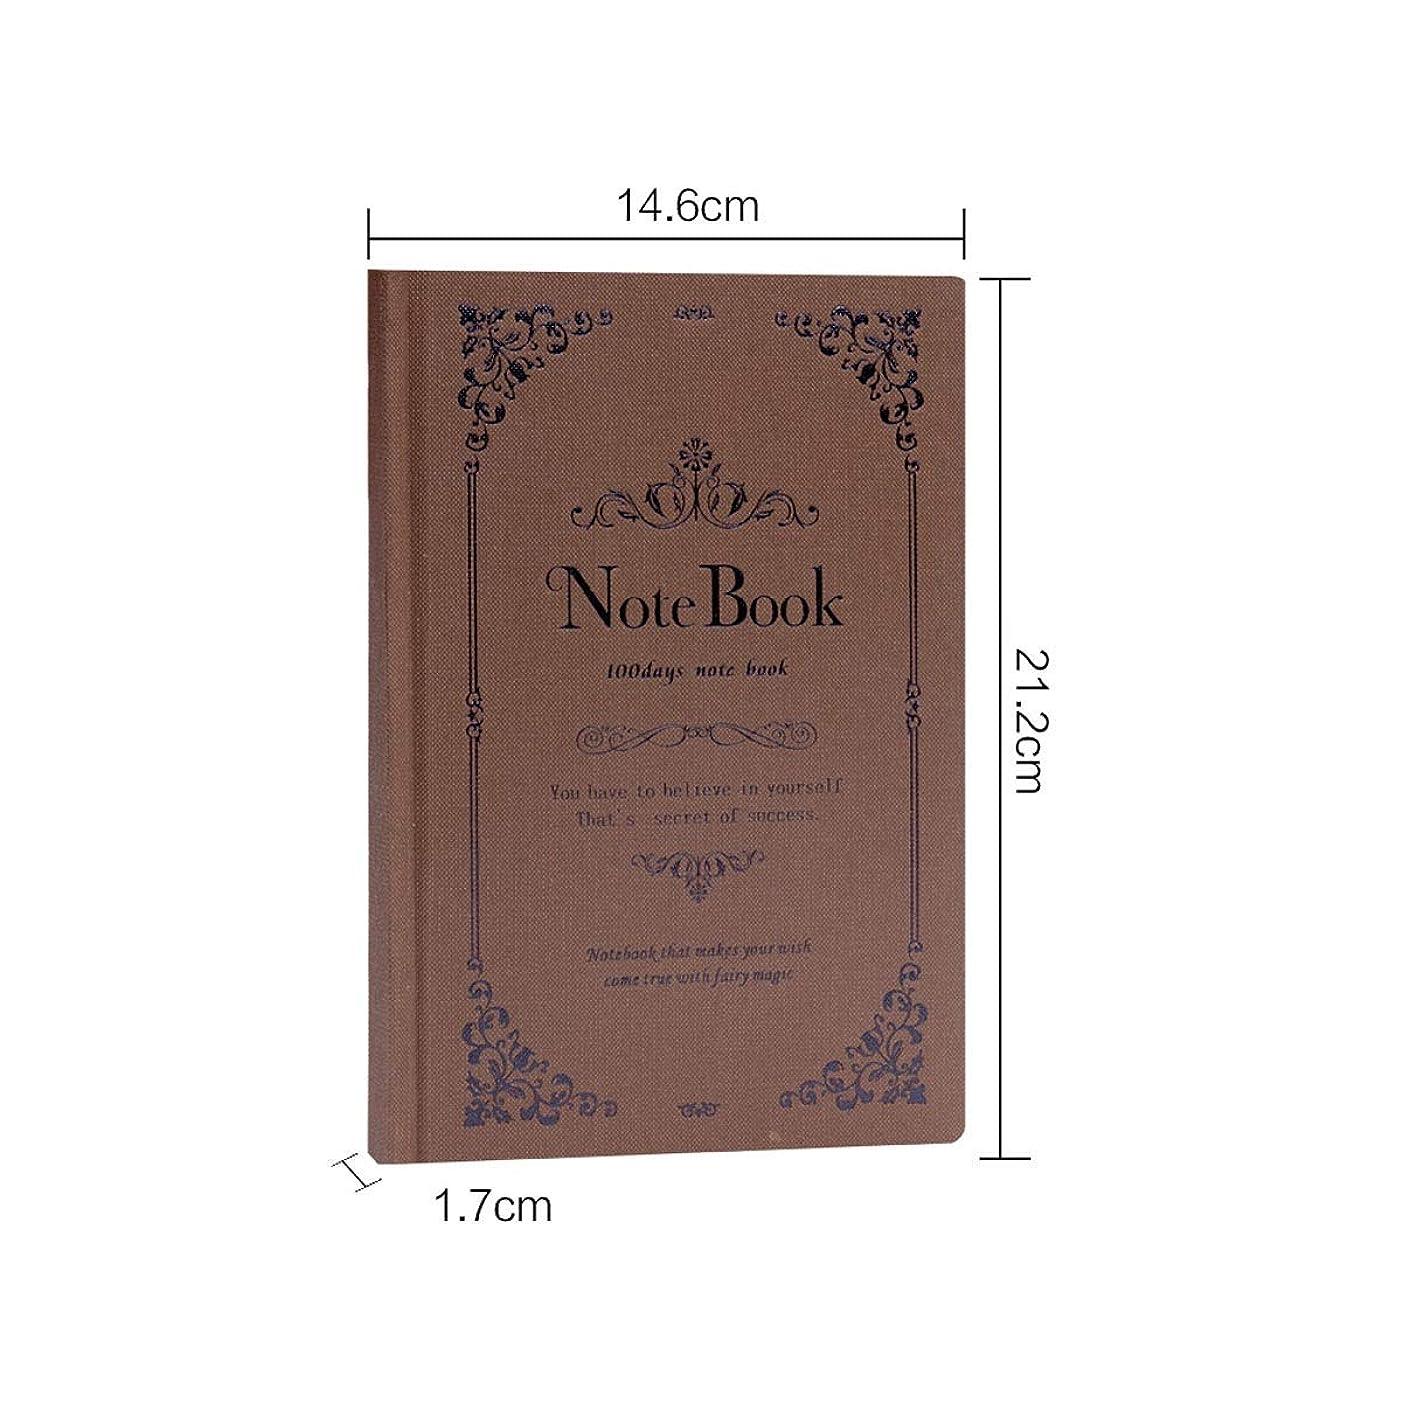 Muziwenju ギフトノートとペンセットギフトボックス、ノートセット、父の日ギフト、ノートブック、パーソナリティクリエイティブ日記、レトロなノートブック、最小限のメモ帳、さまざまなモデル 高品質の製品 7 (Style : D)